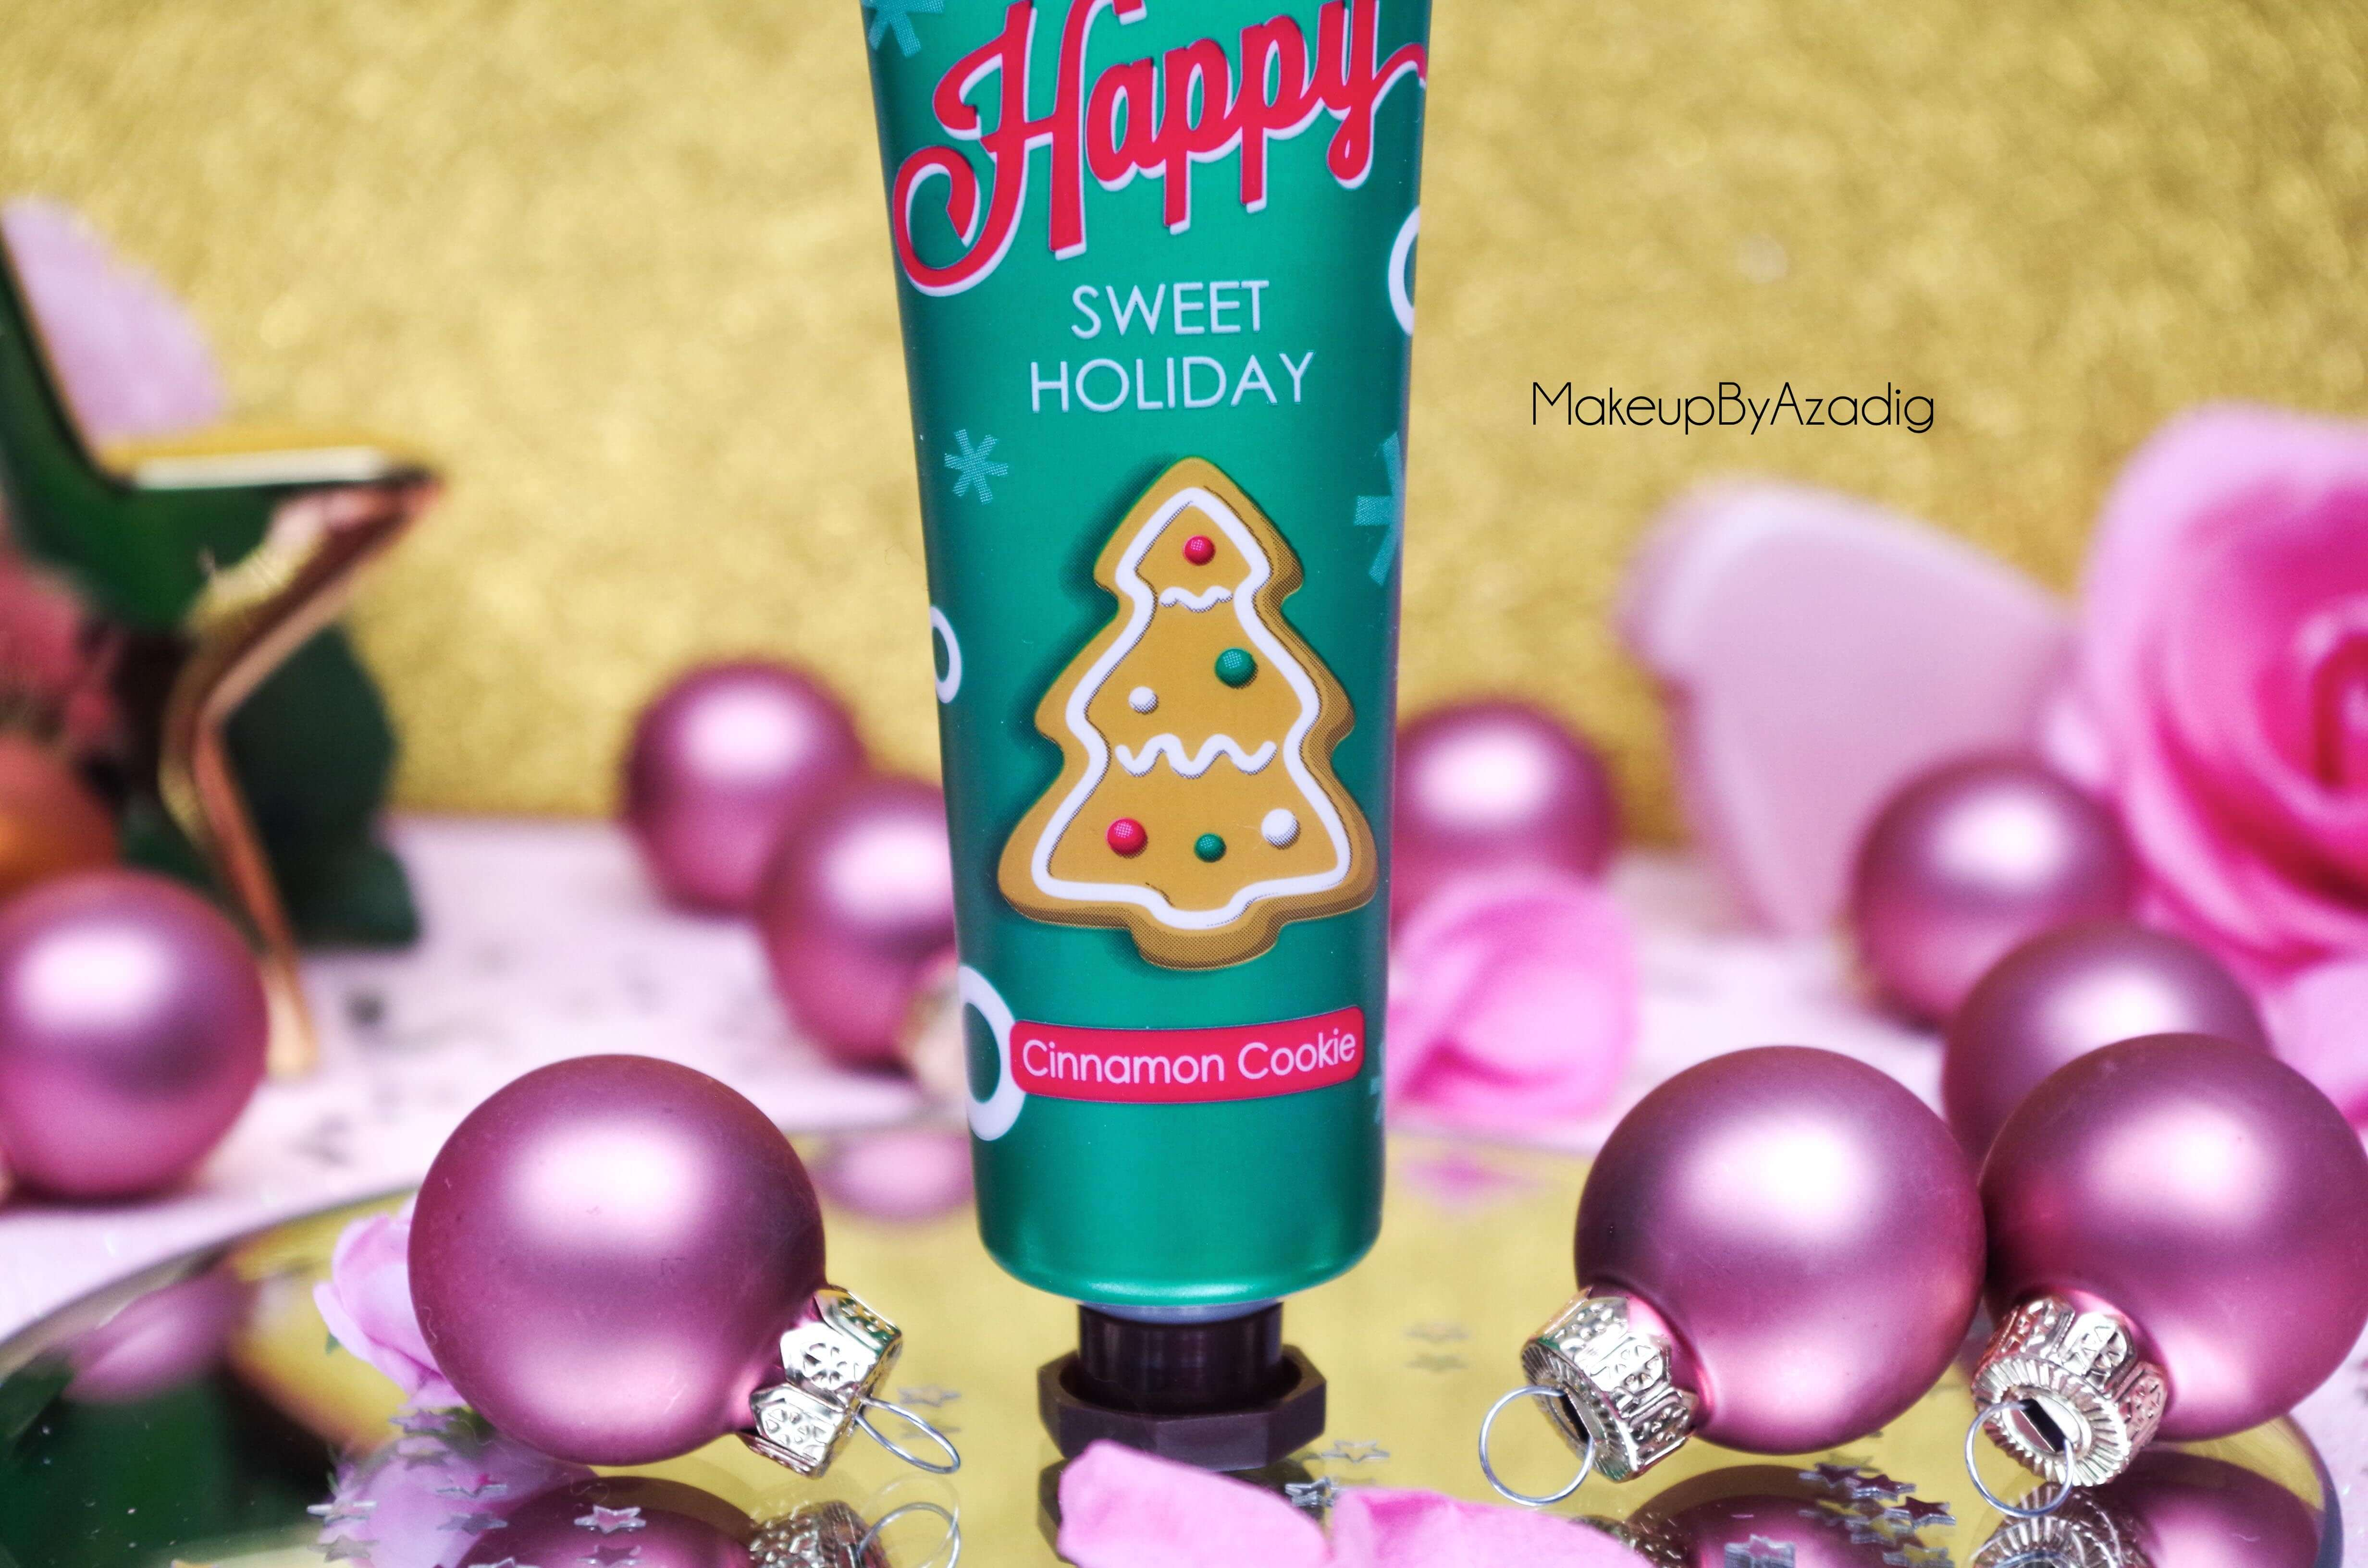 makeupbyazadig-tonymoly-sephora-paris-troyes-creme-mains-collection-noel-holiday-avis-revue-cookie